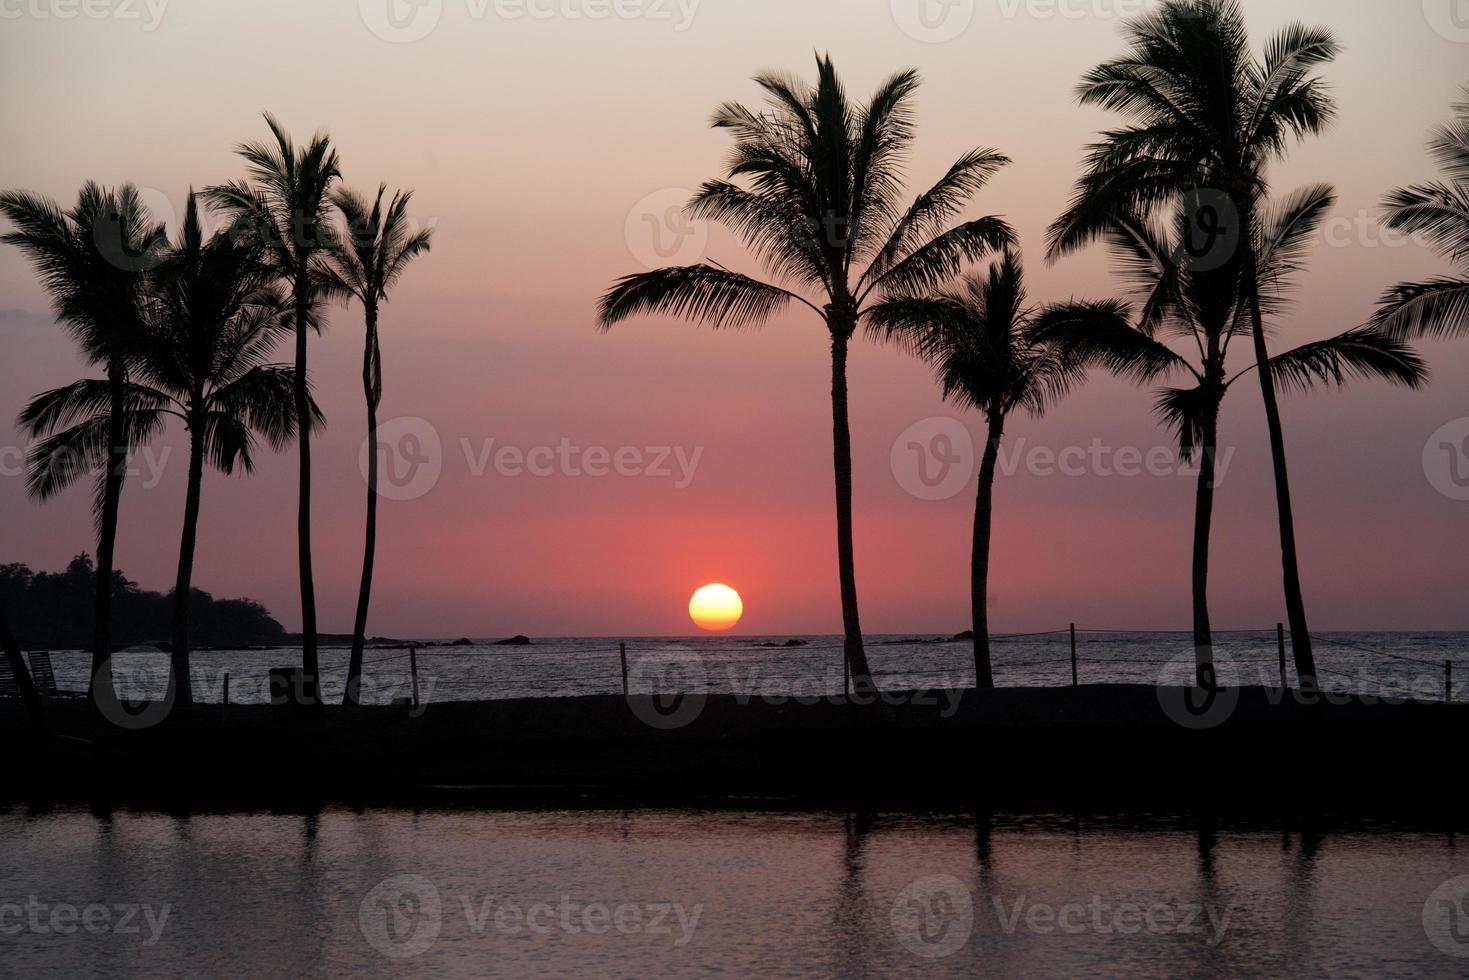 Sonnenuntergang auf Hawaii große Insel foto